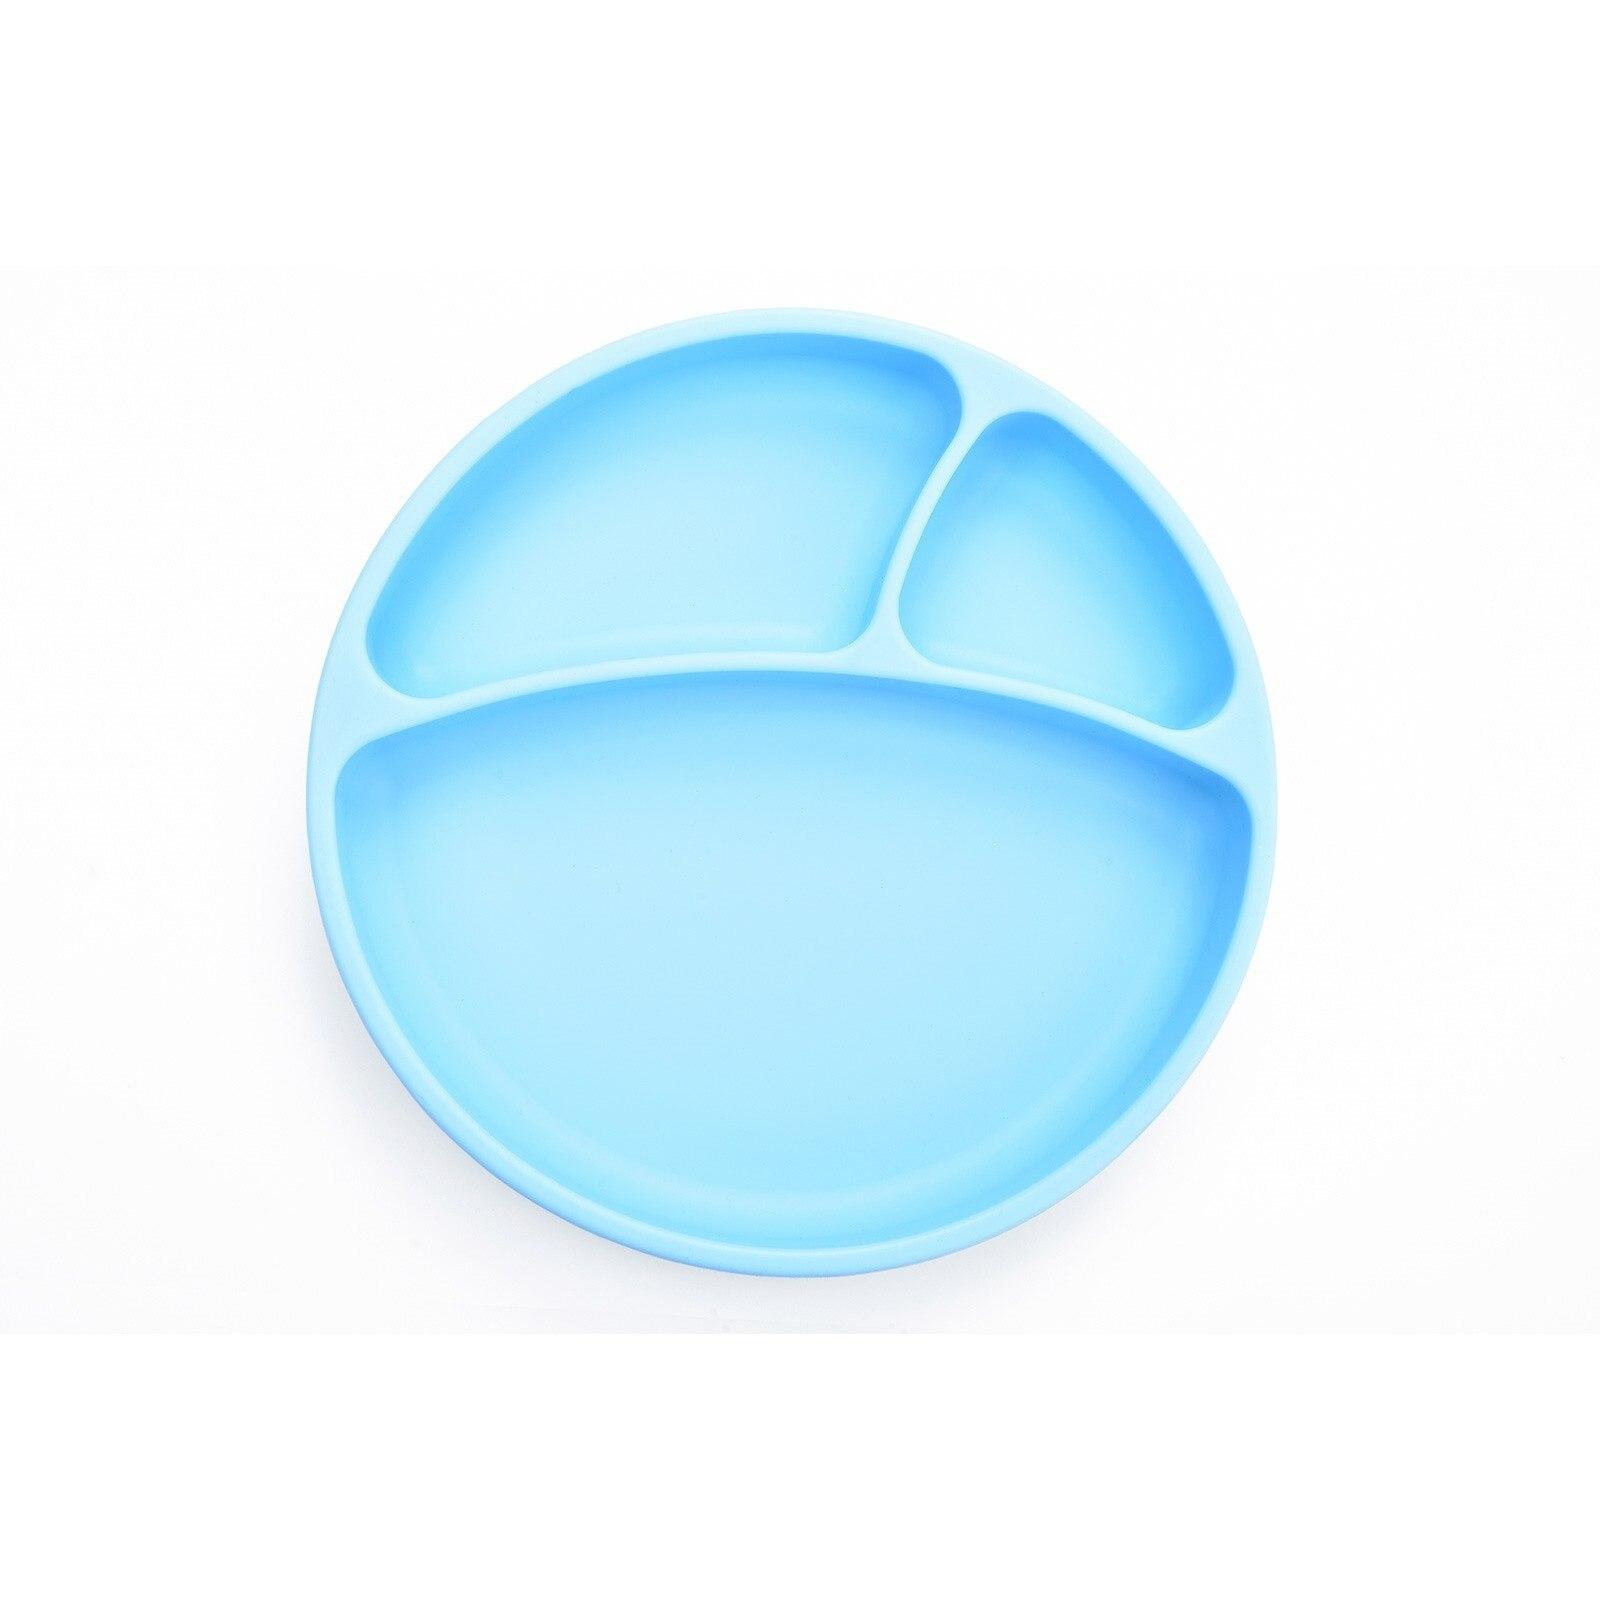 Ebebek Oioi Vacuum Based Silicon Plate Blue